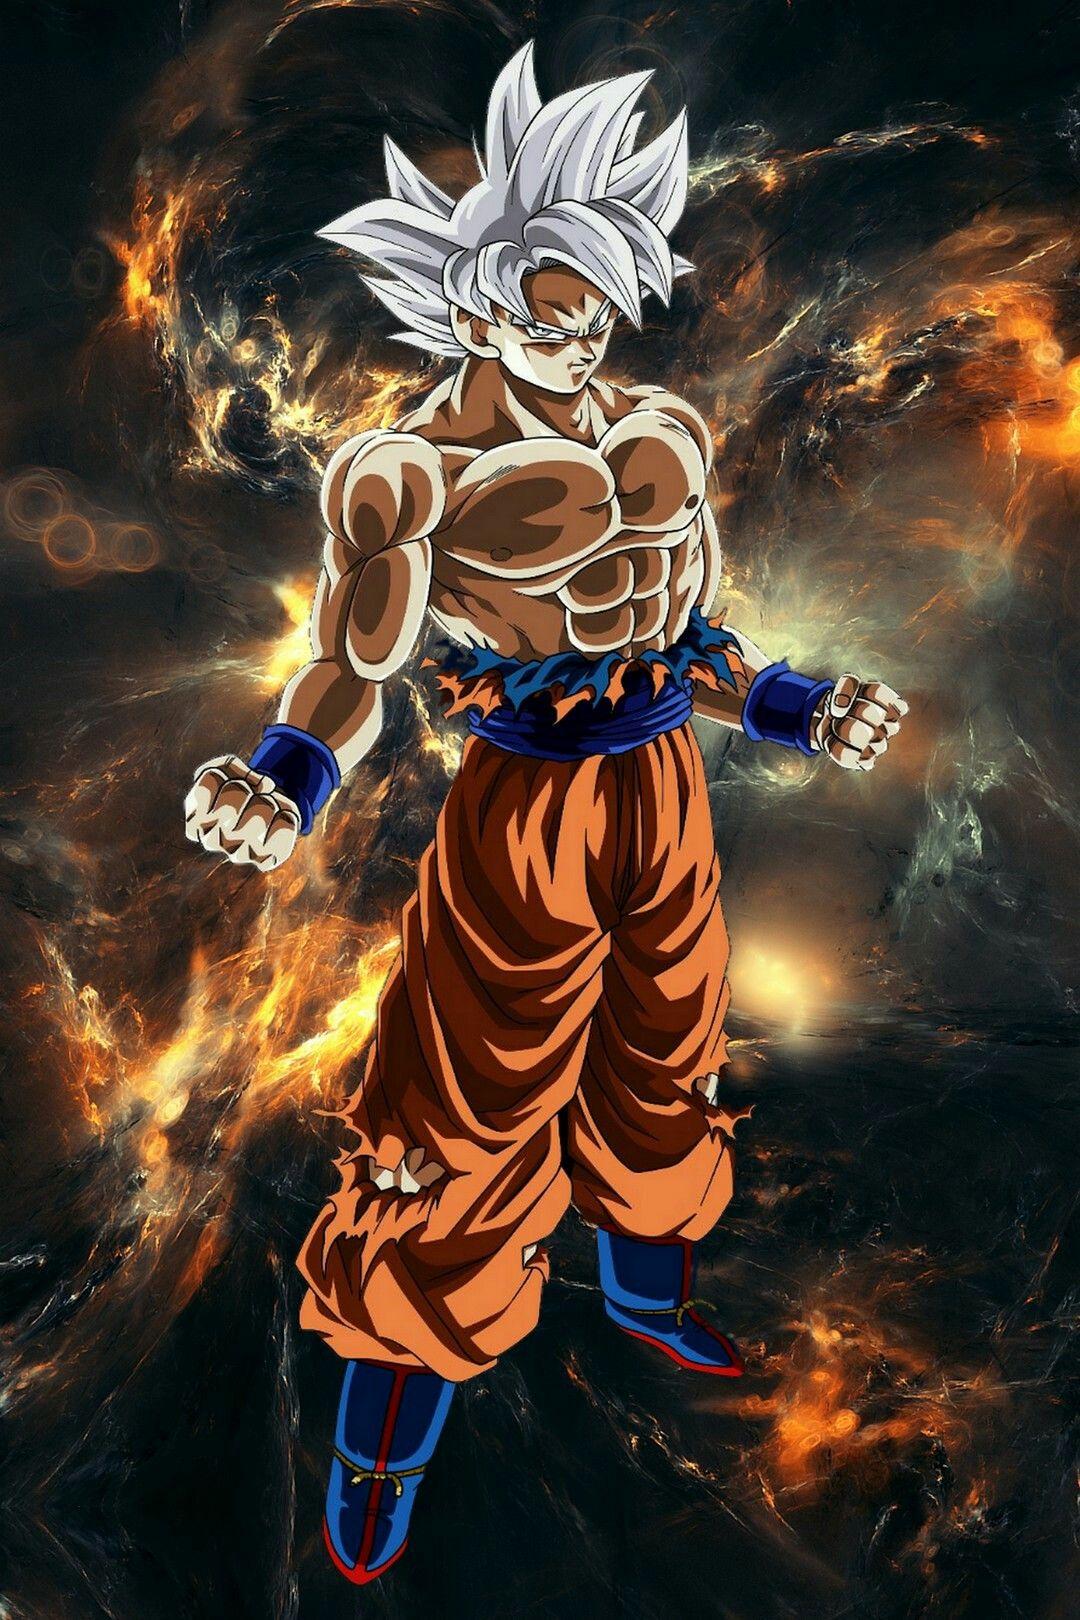 Goku mastered ultra instinct db dragon ball gt dragon y goku - Imagenes de dragon ball super ultra instinto ...